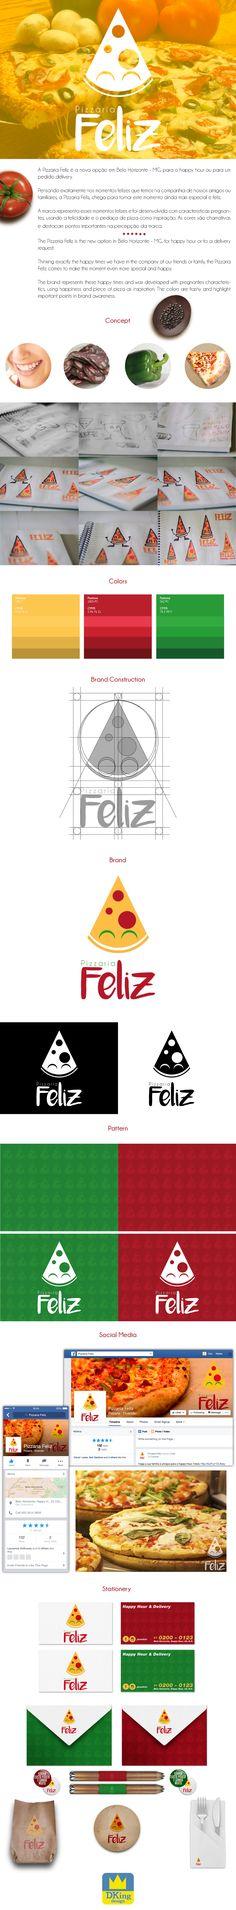 Pizzaria Feliz | Brand